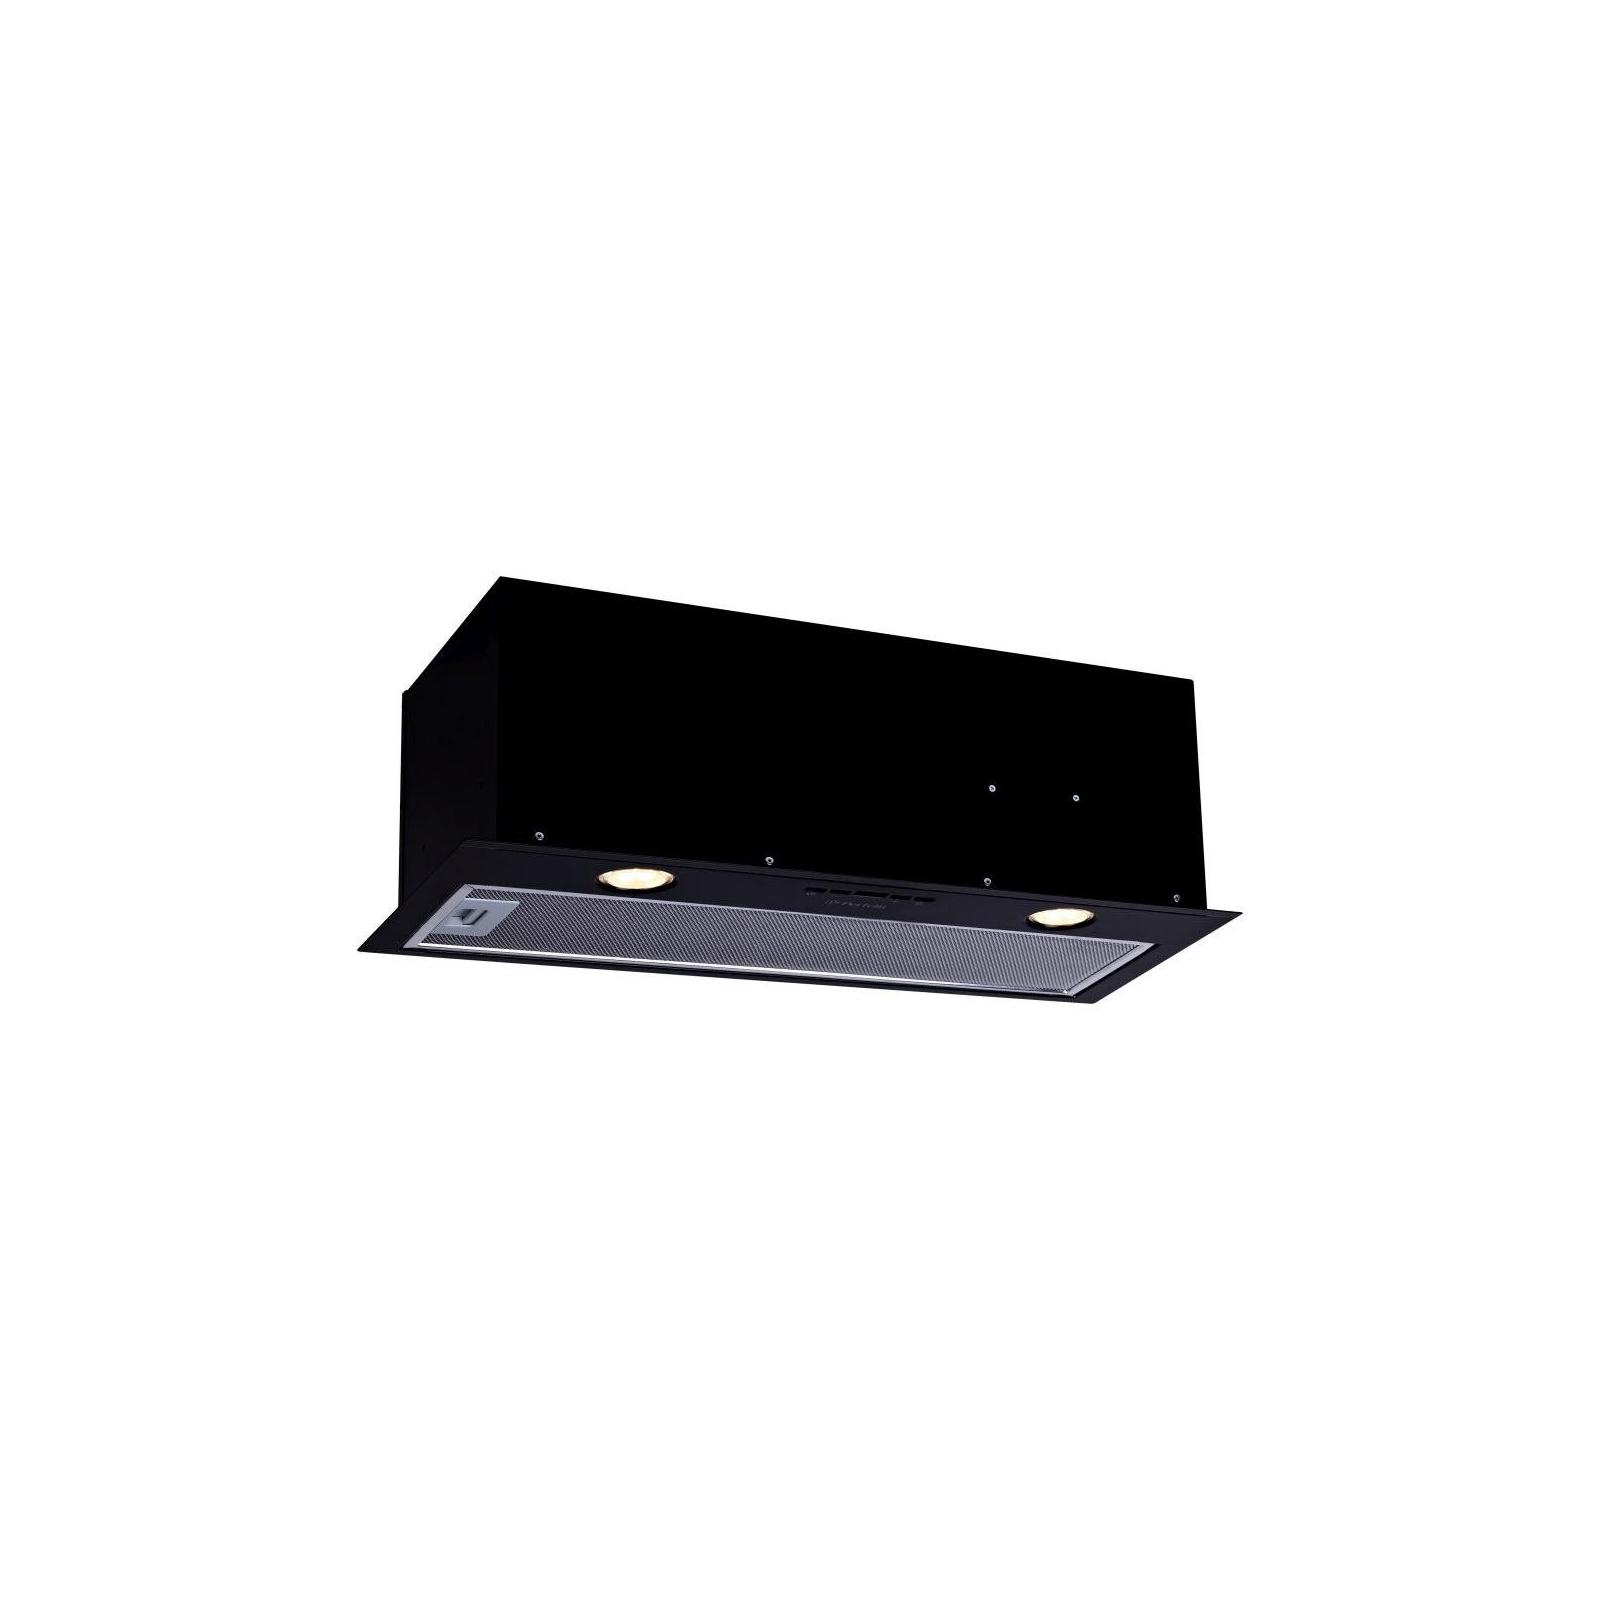 Вытяжка кухонная PERFELLI BIET 6512 A 1000 BL LED изображение 3